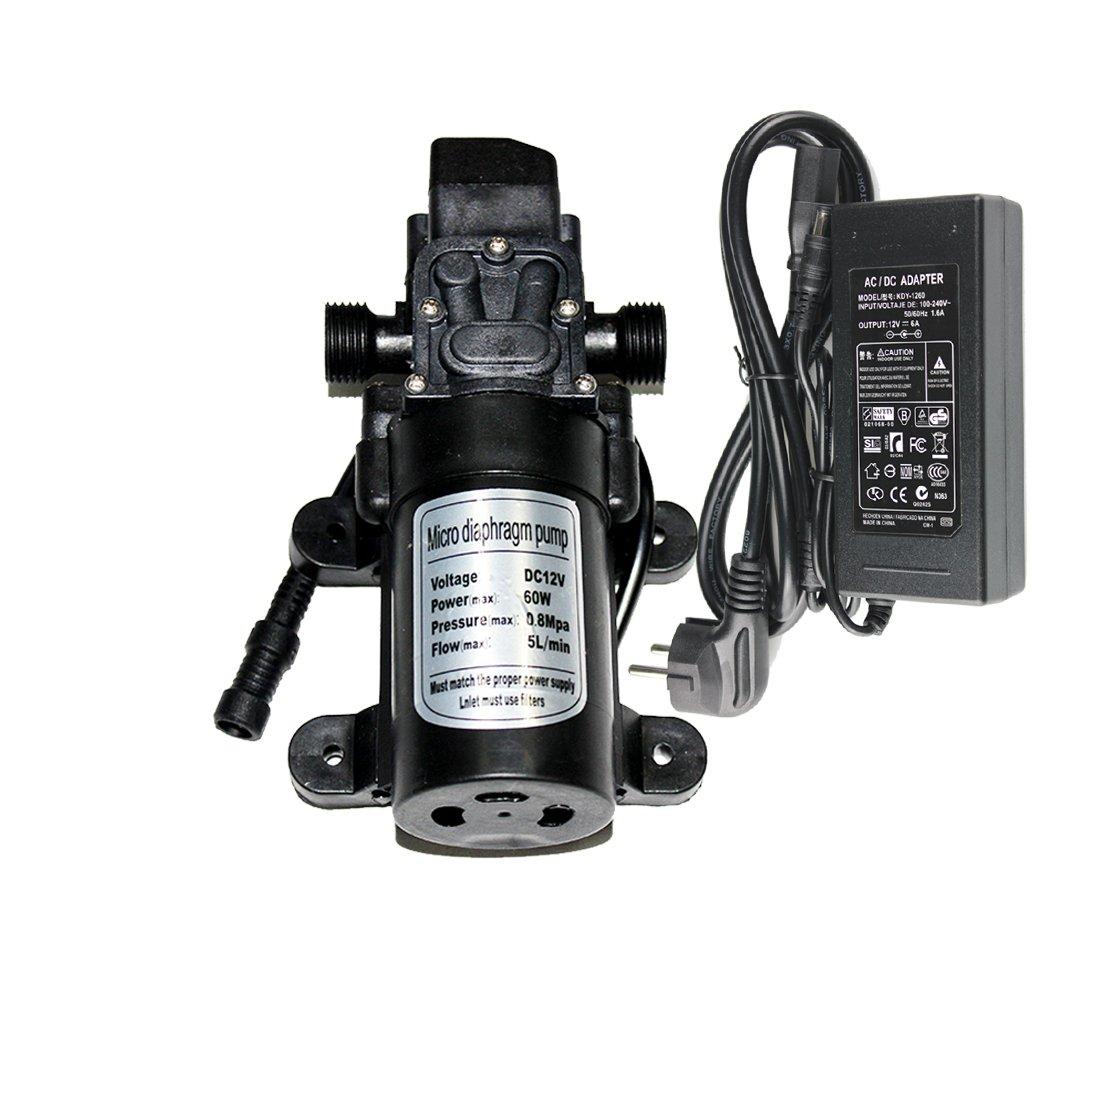 Hylaea 12V 60W 5L/min Self Priming Fine Mist Spray Micro Fresh Water Pressure Diaphragm Pump with 12V DC High Pressure for RV Camper Marine Boat Lawn